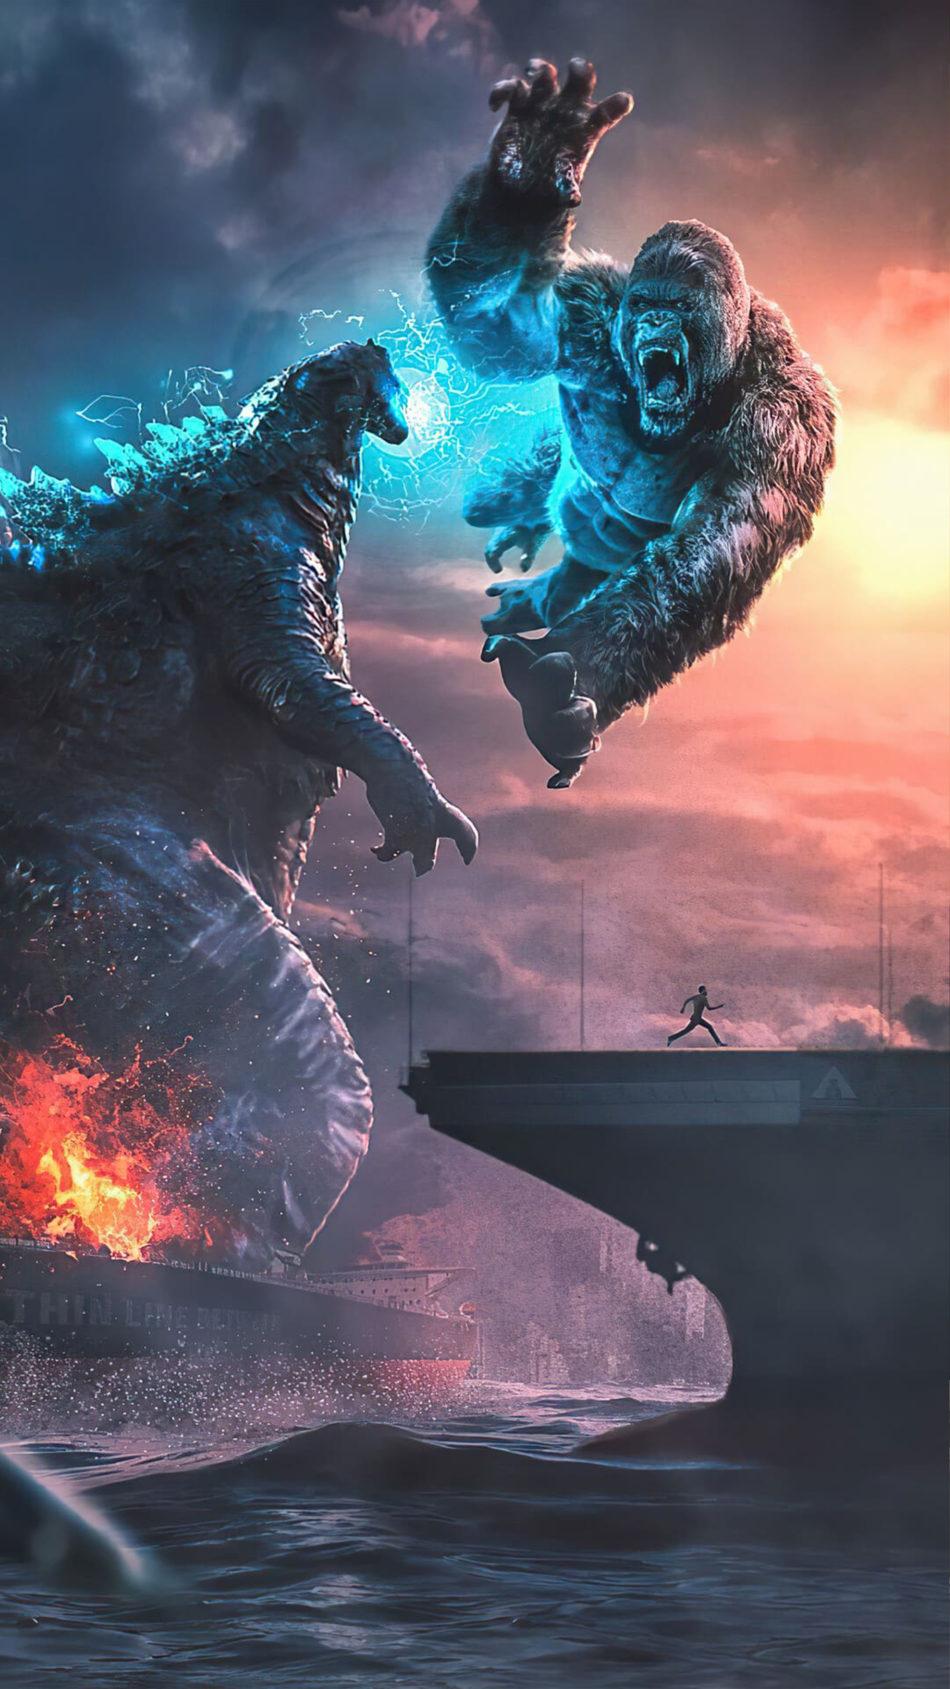 Godzilla Vs Kong Fighting 4K Ultra HD Mobile Wallpaper